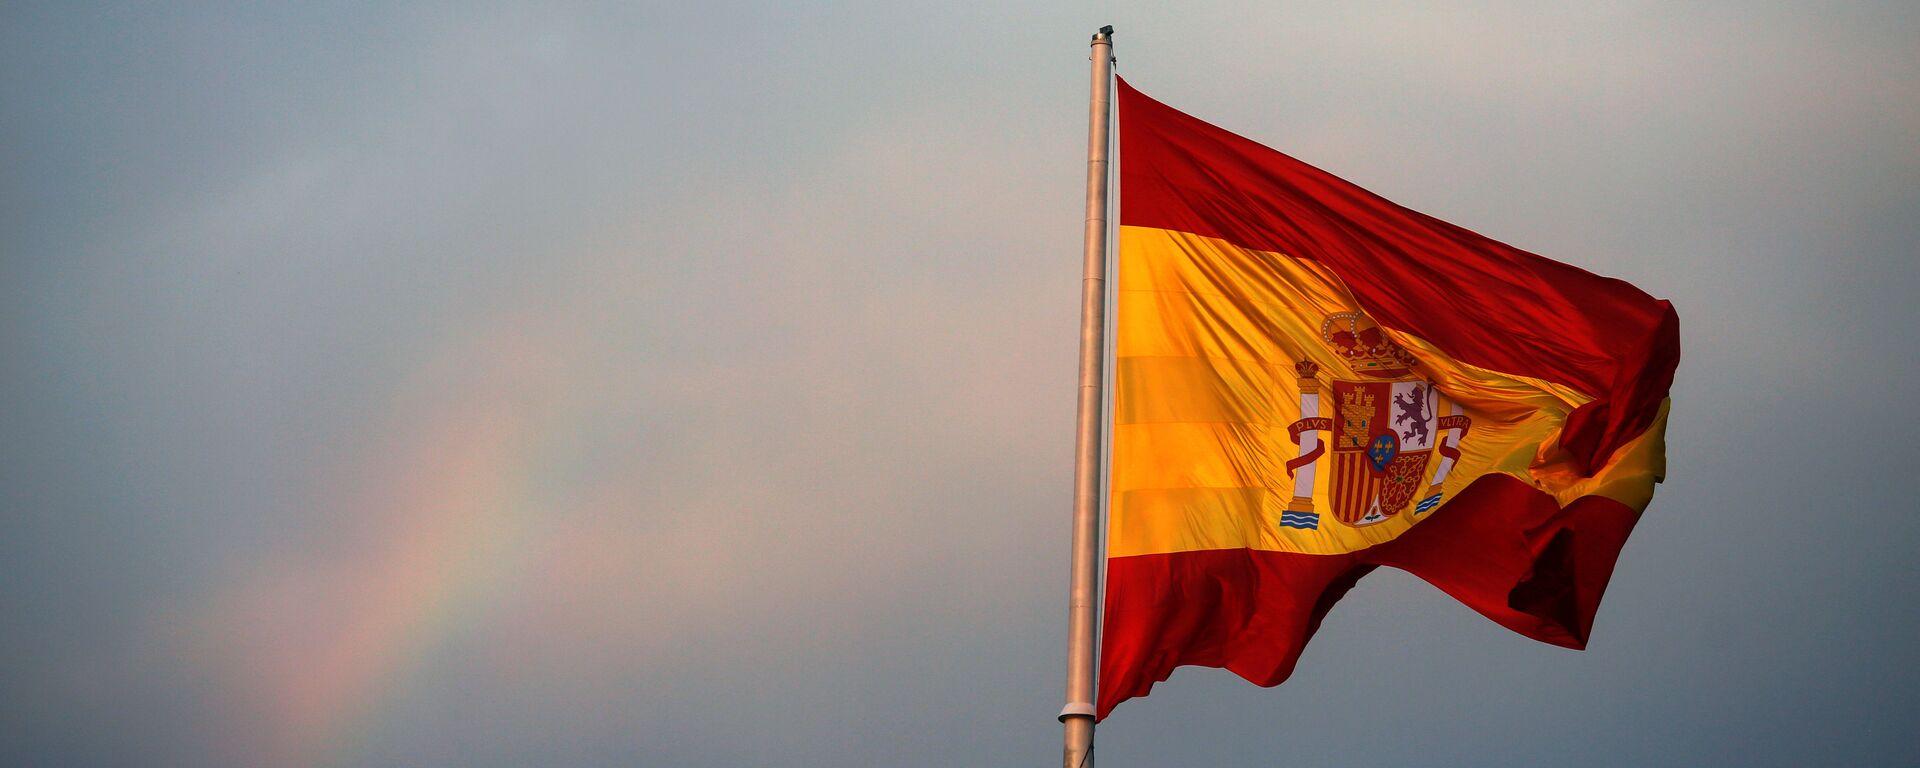 Bandera de España - Sputnik Mundo, 1920, 11.03.2021